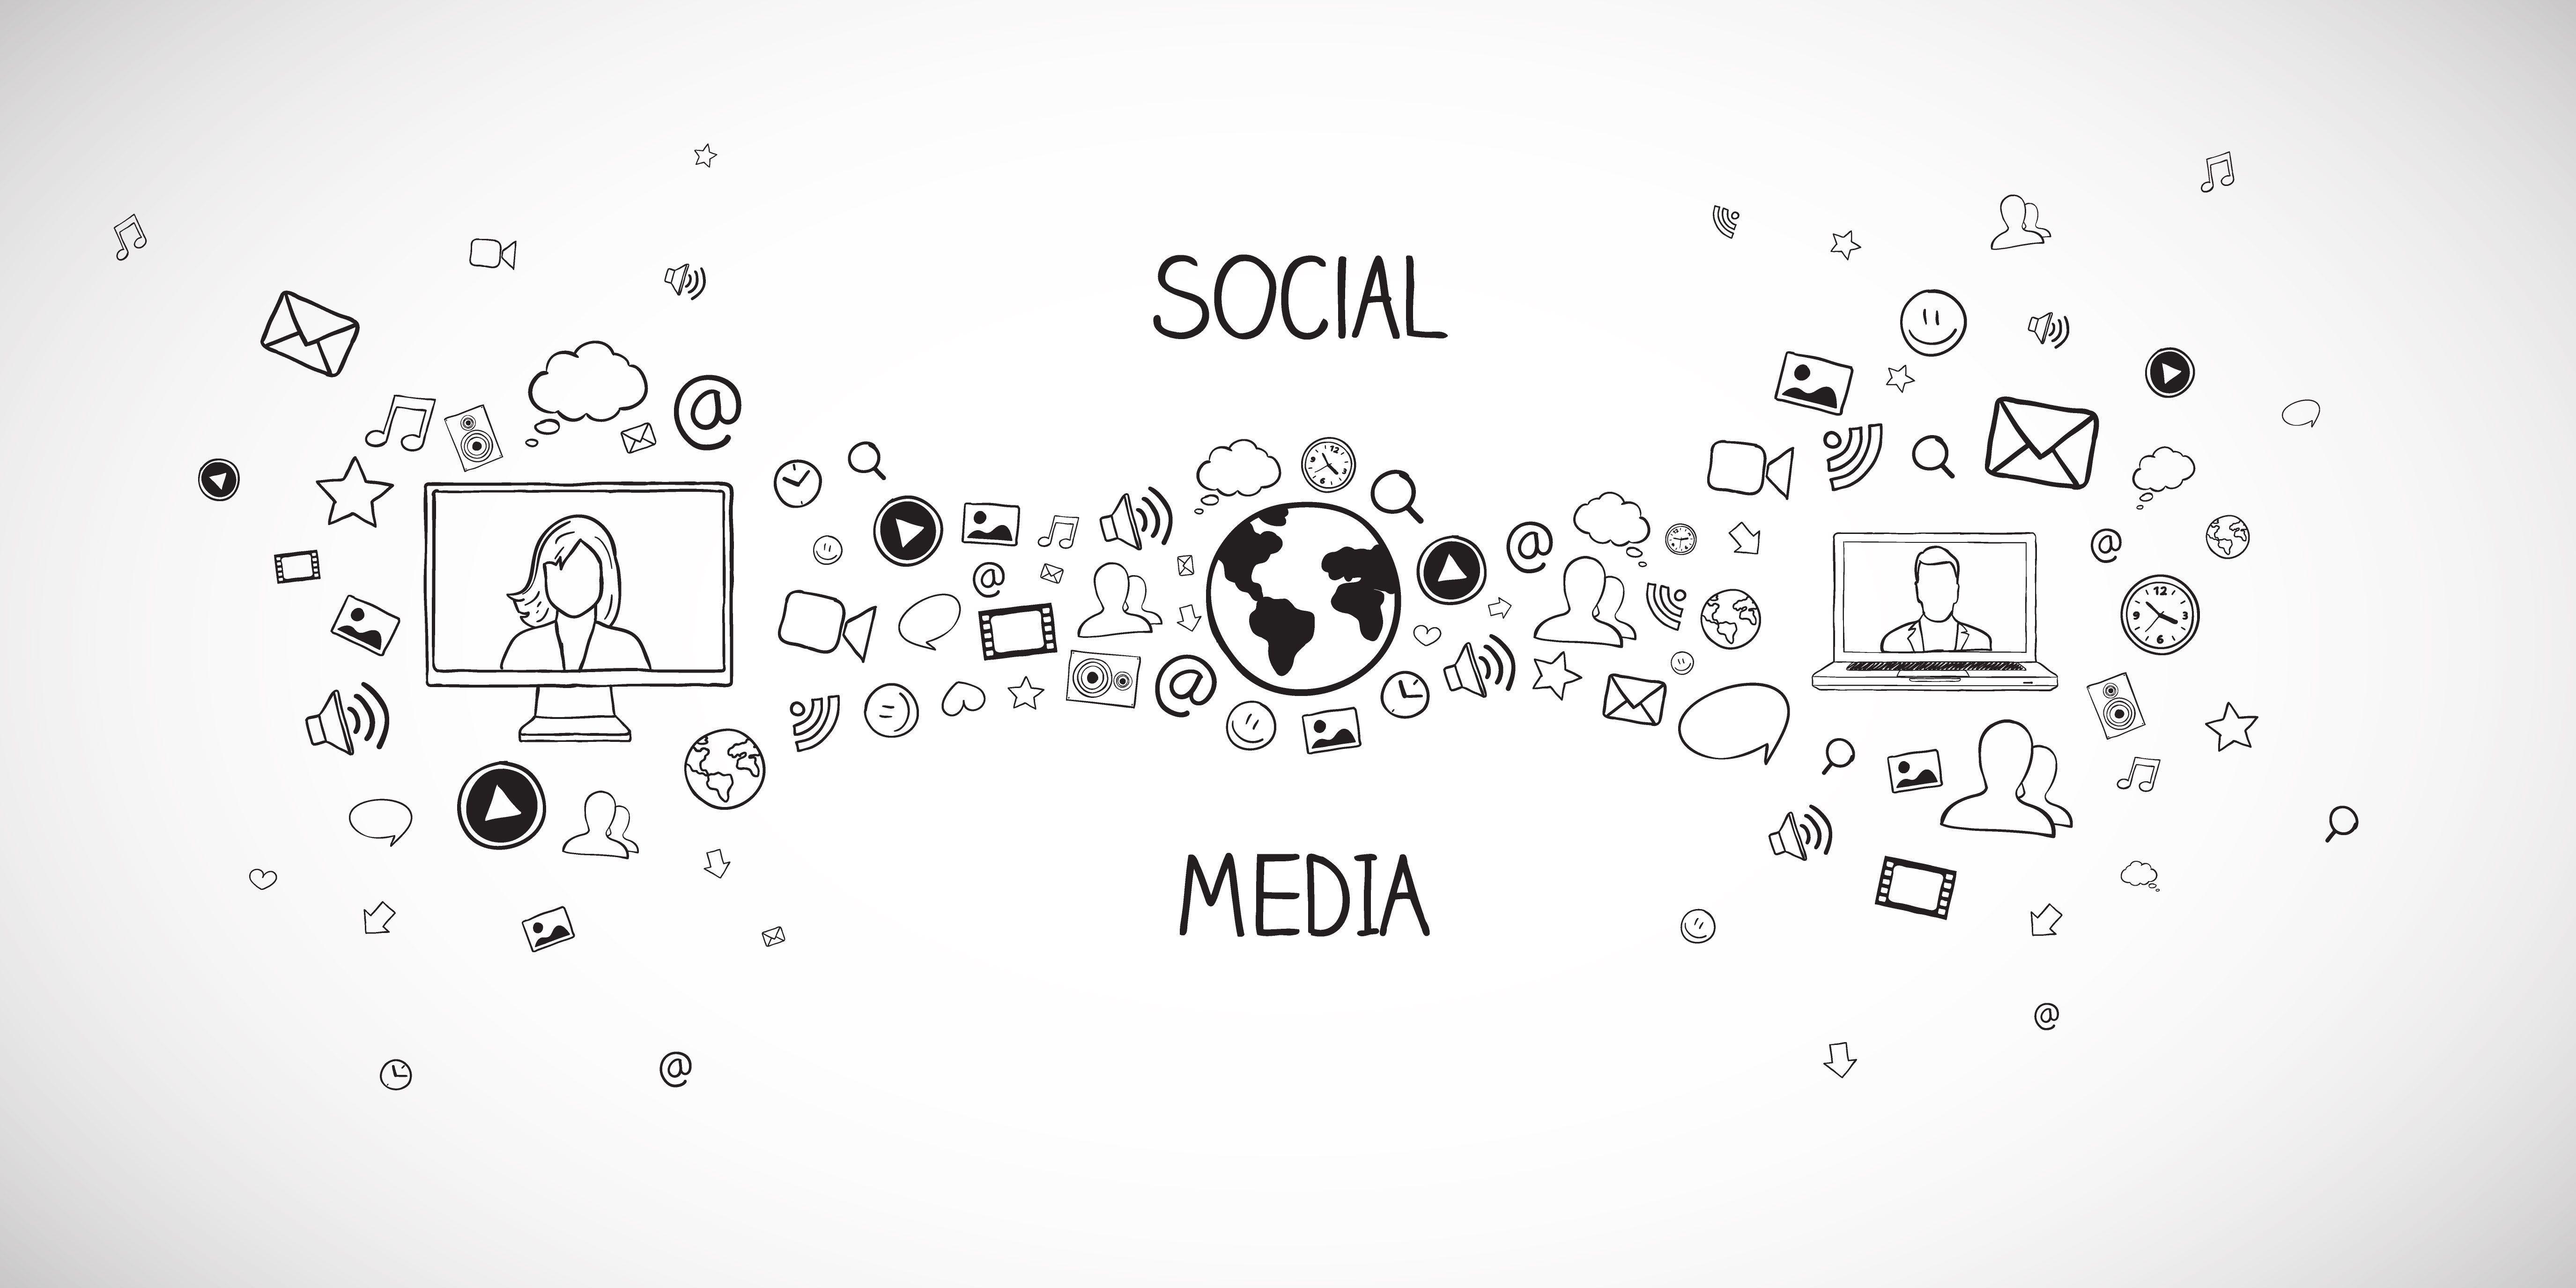 5-social-media-hacks-to-increase-your-click-through-rates